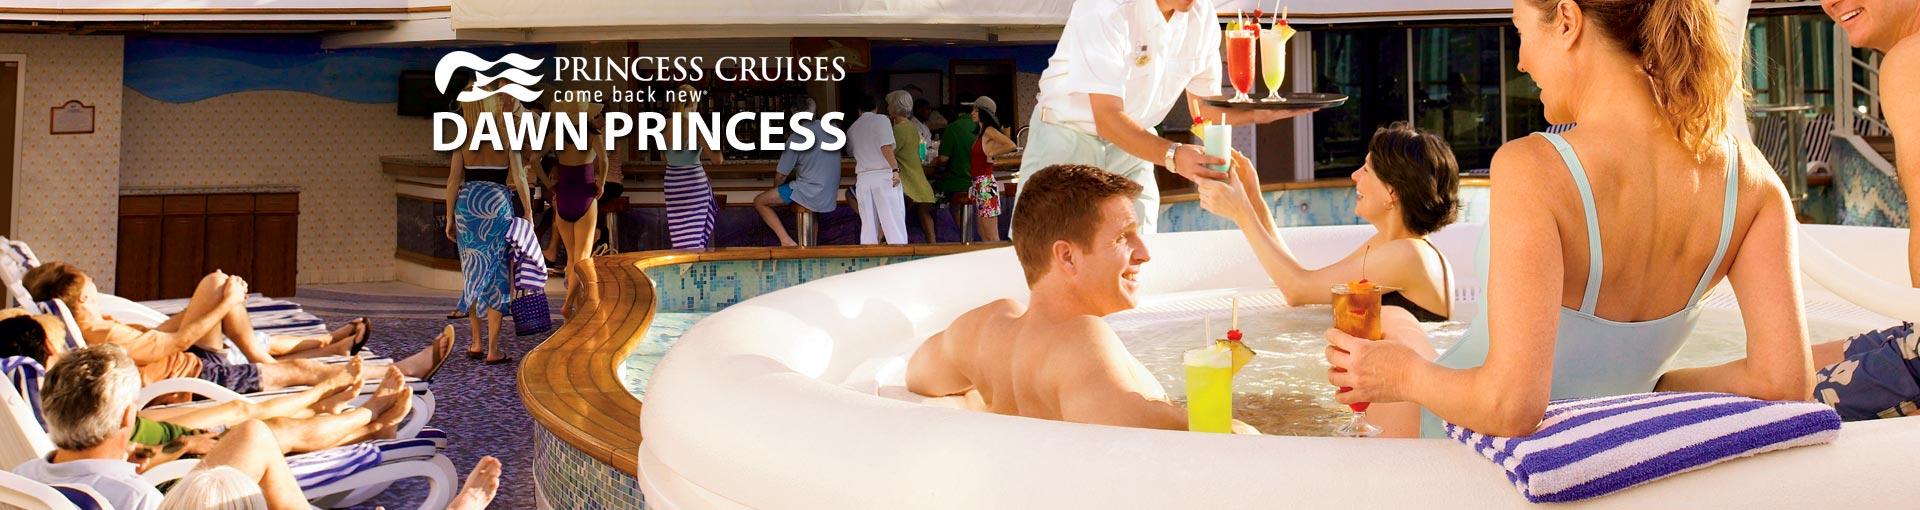 Princess Cruises Dawn Princess cruise ship